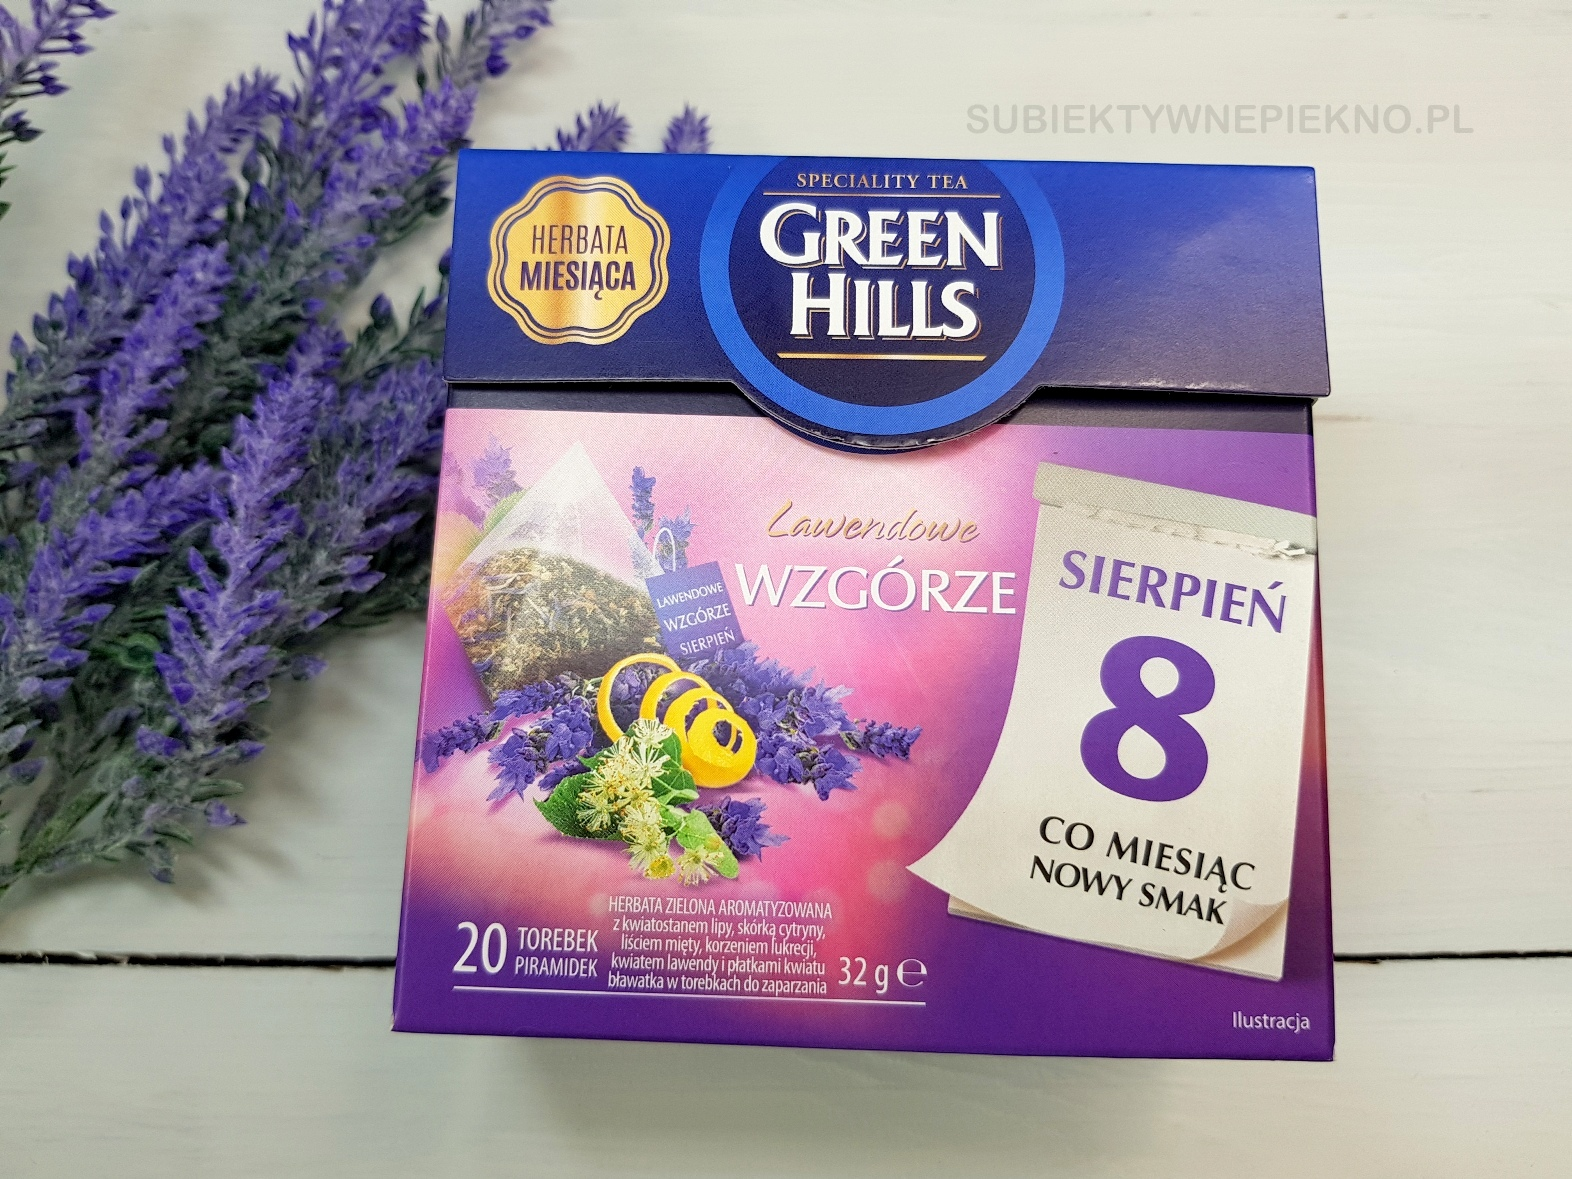 zielona herbata lawendowe wzgórze green hills biedronka